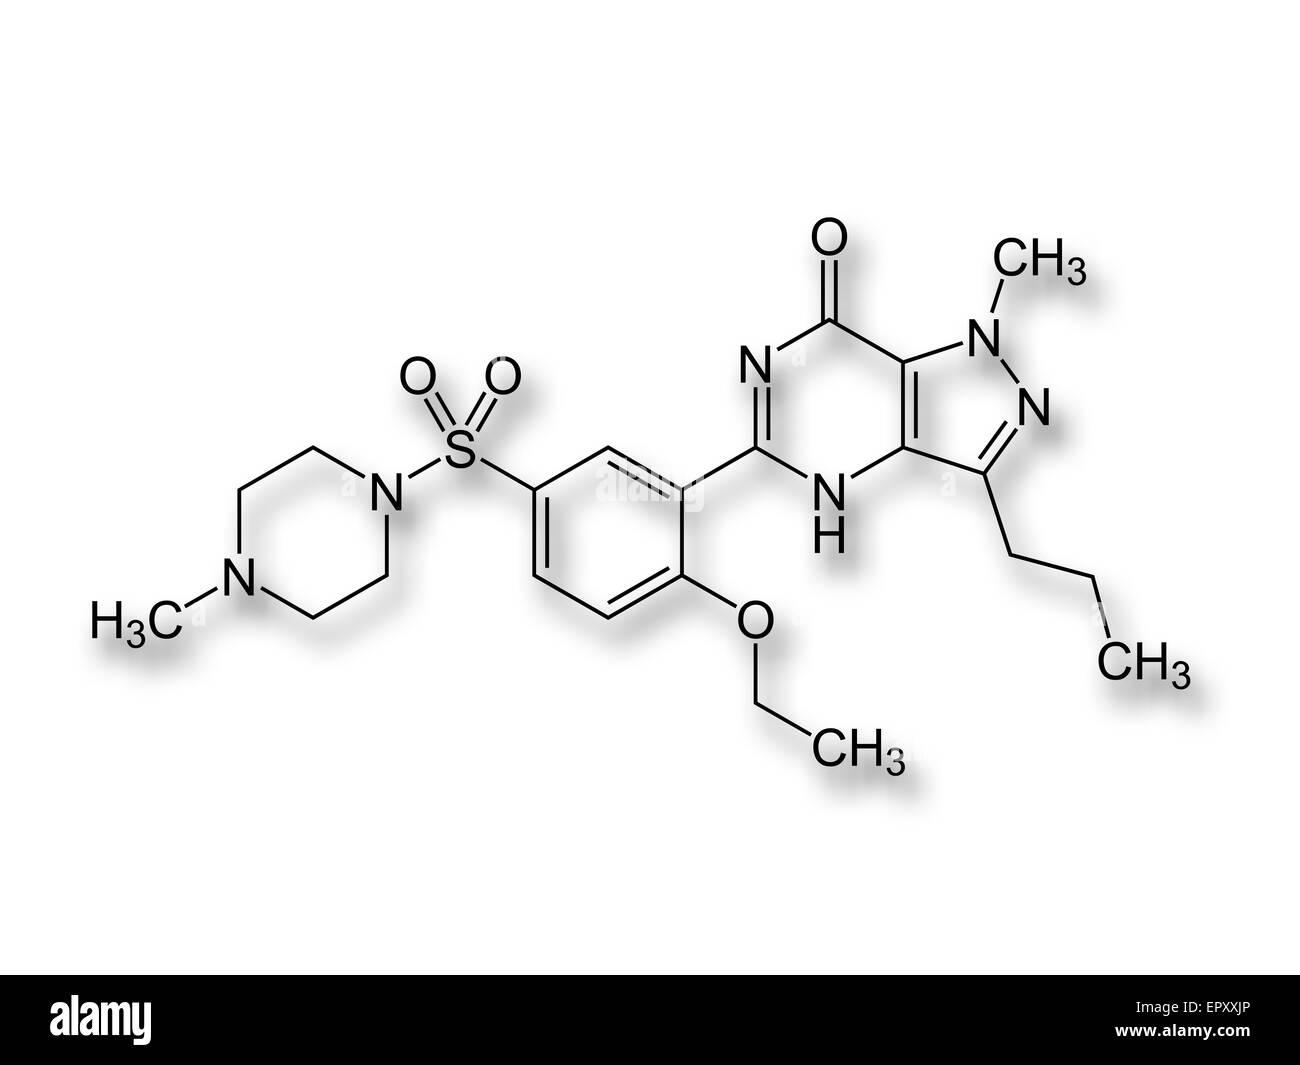 Viagra Structure Formulae Of The Drug Viagra Sildenafil The